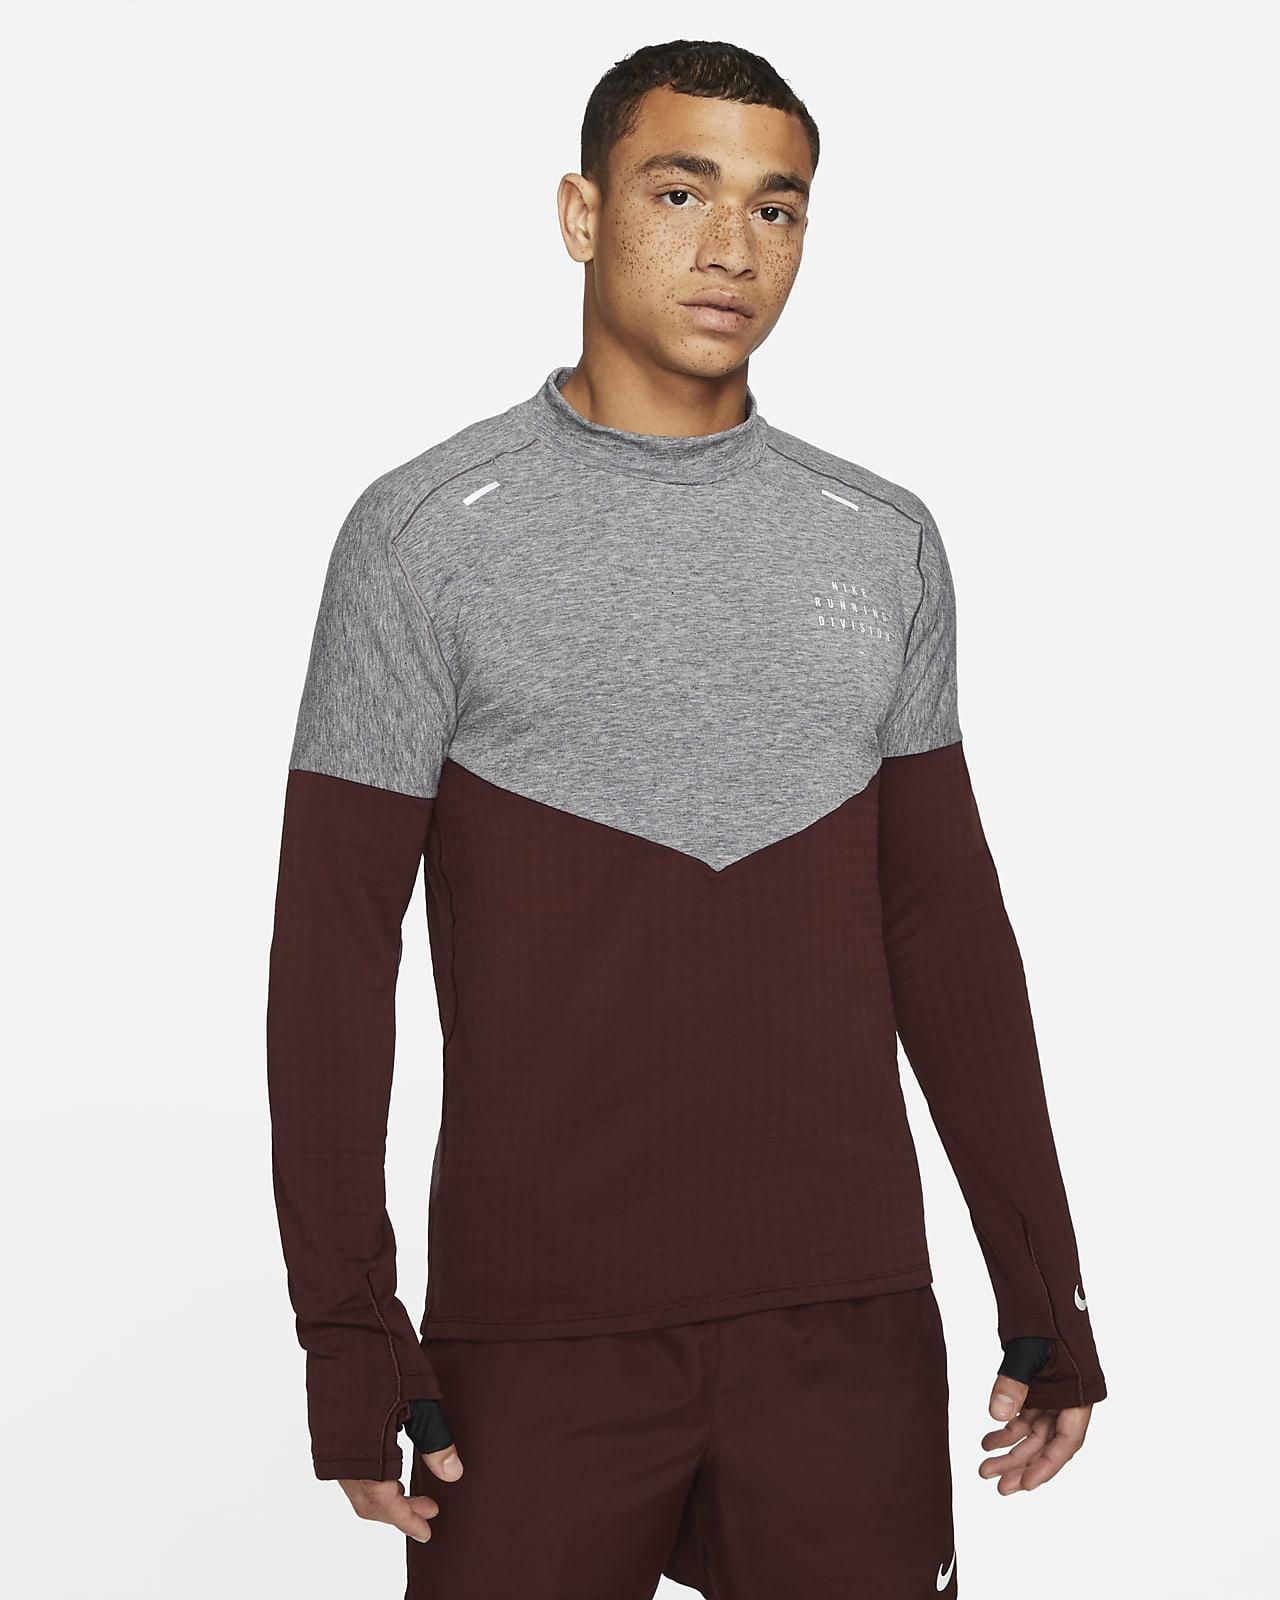 Męska wełniana koszulka do biegania Nike Sphere Run Division